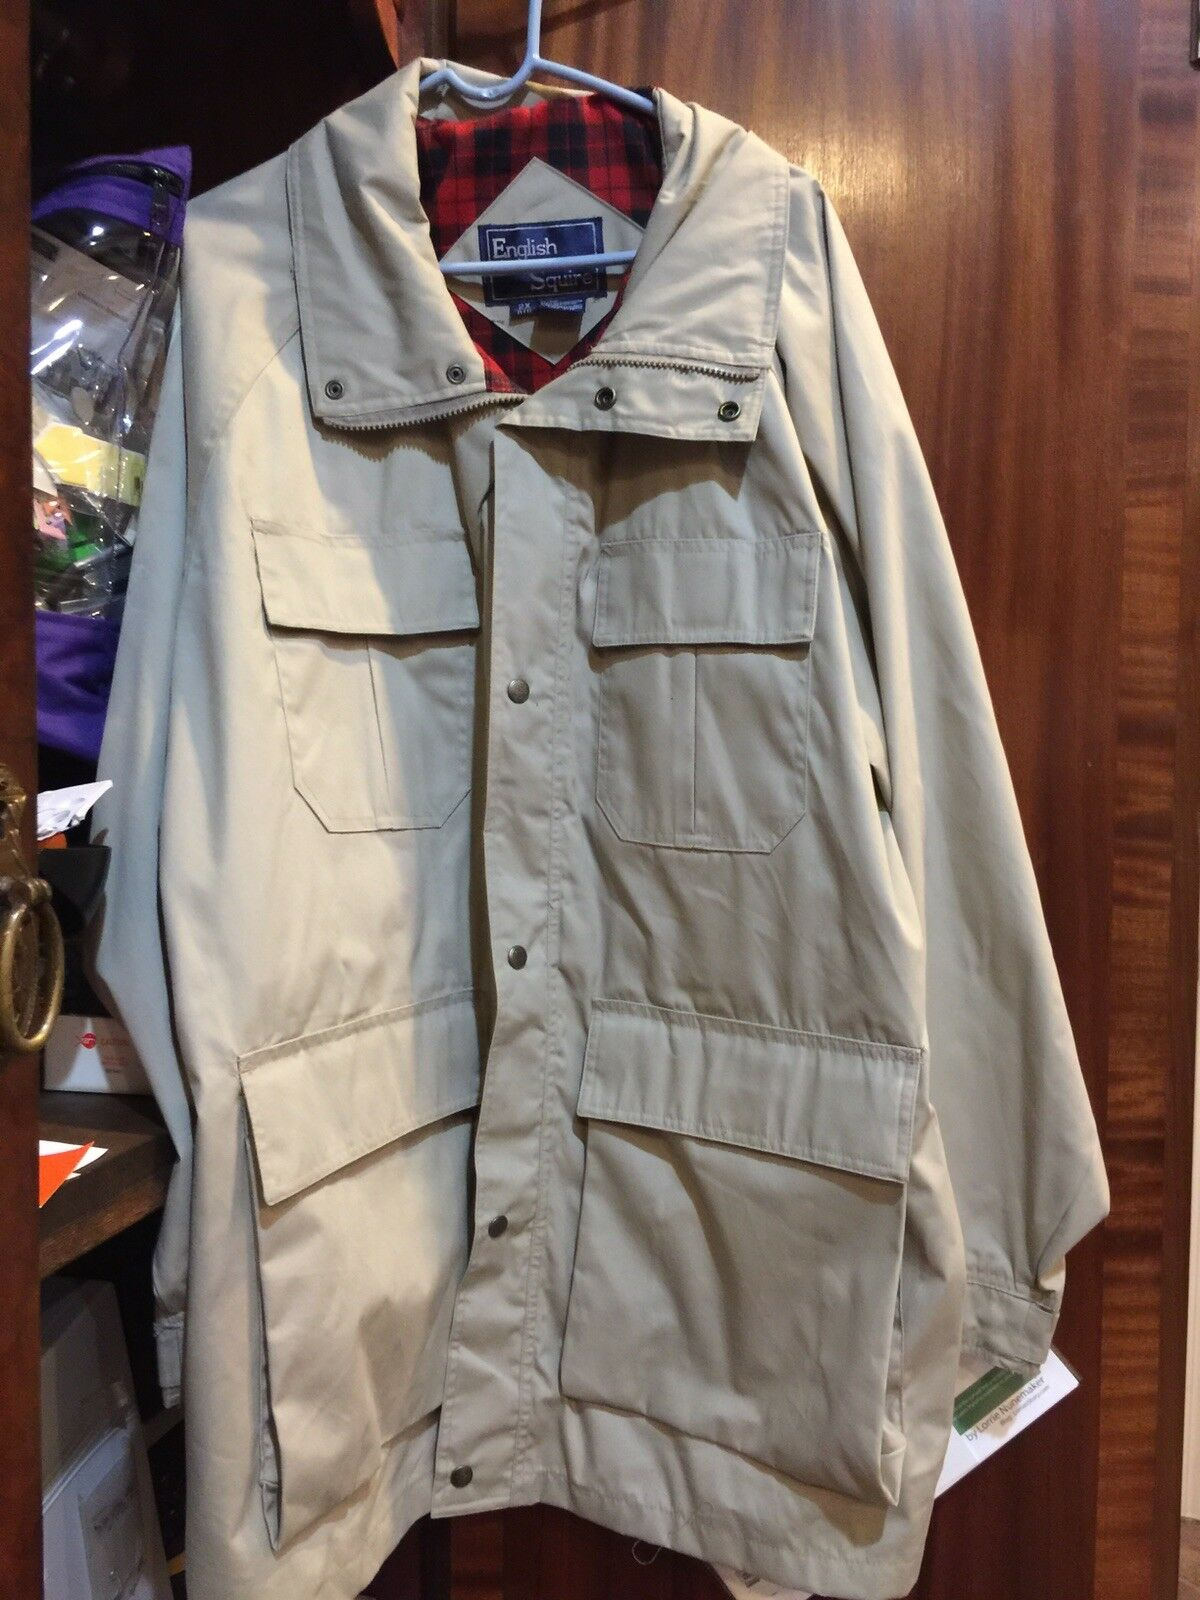 Men's Big&Tall 2x Coat detachable hood                    Great Christmas presen